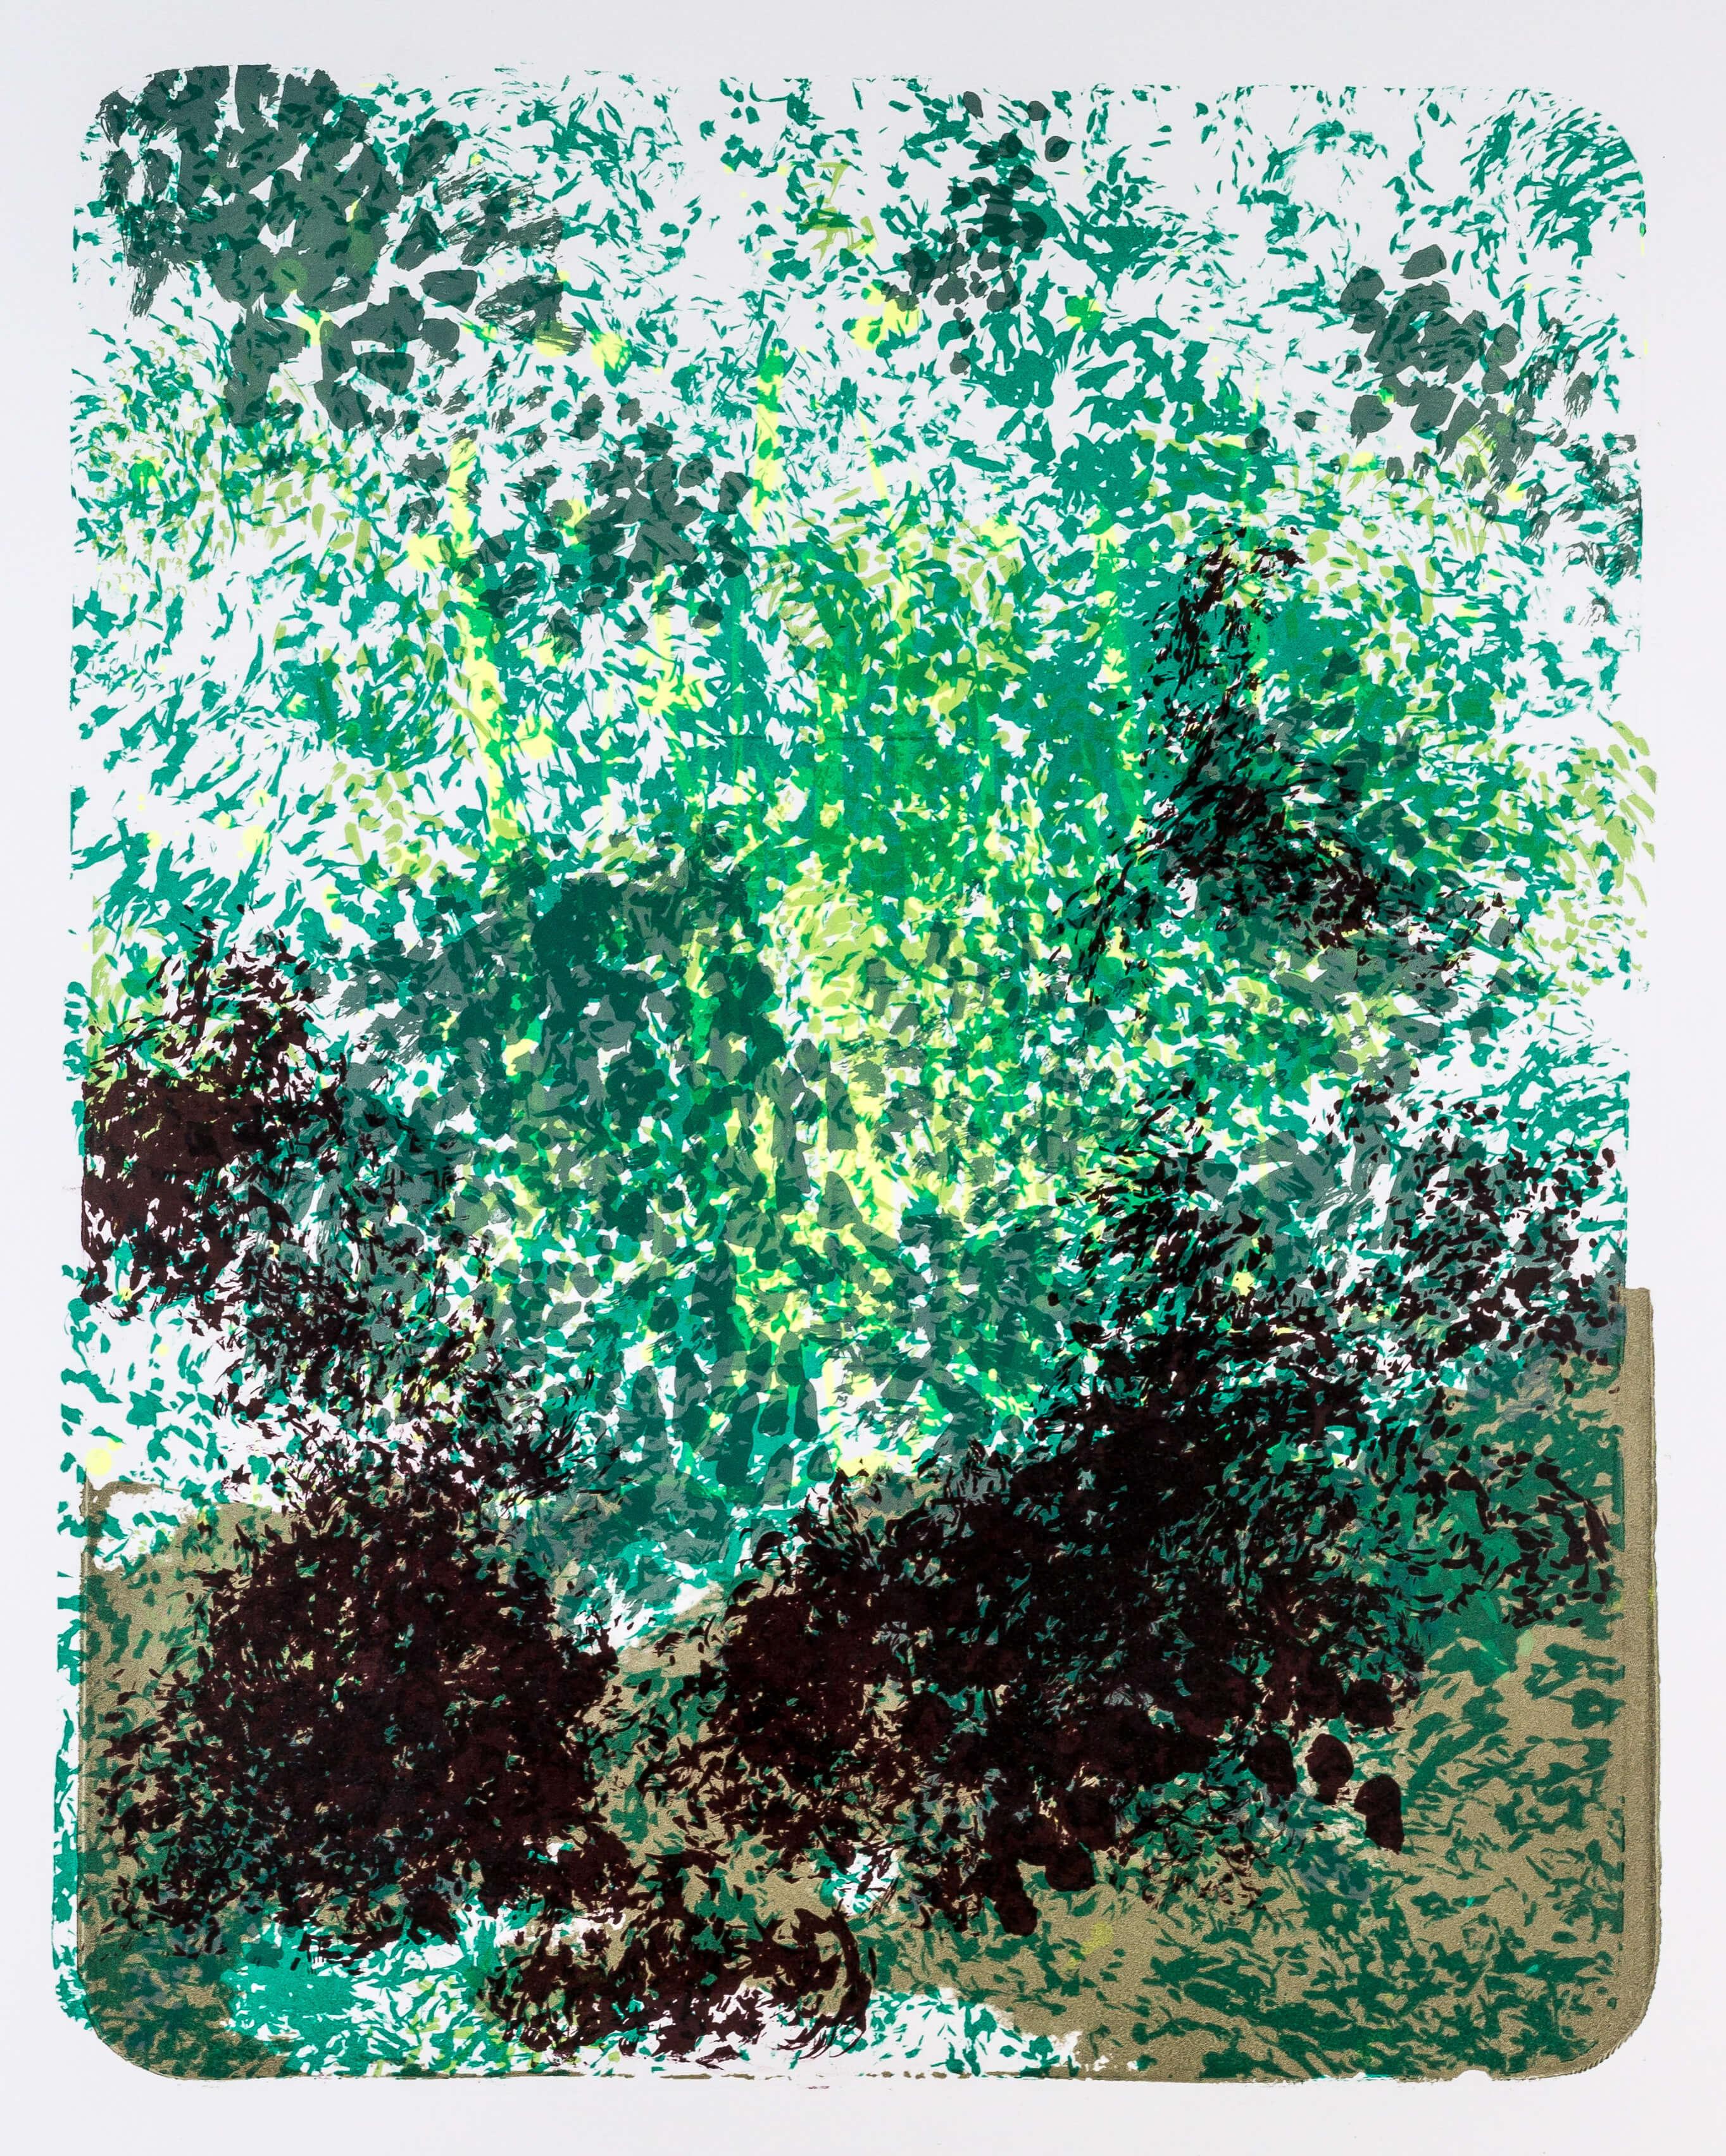 Katharina Albers, Wald X-XIII, 2015, Farblithographie, Unikat, 50×40 cm